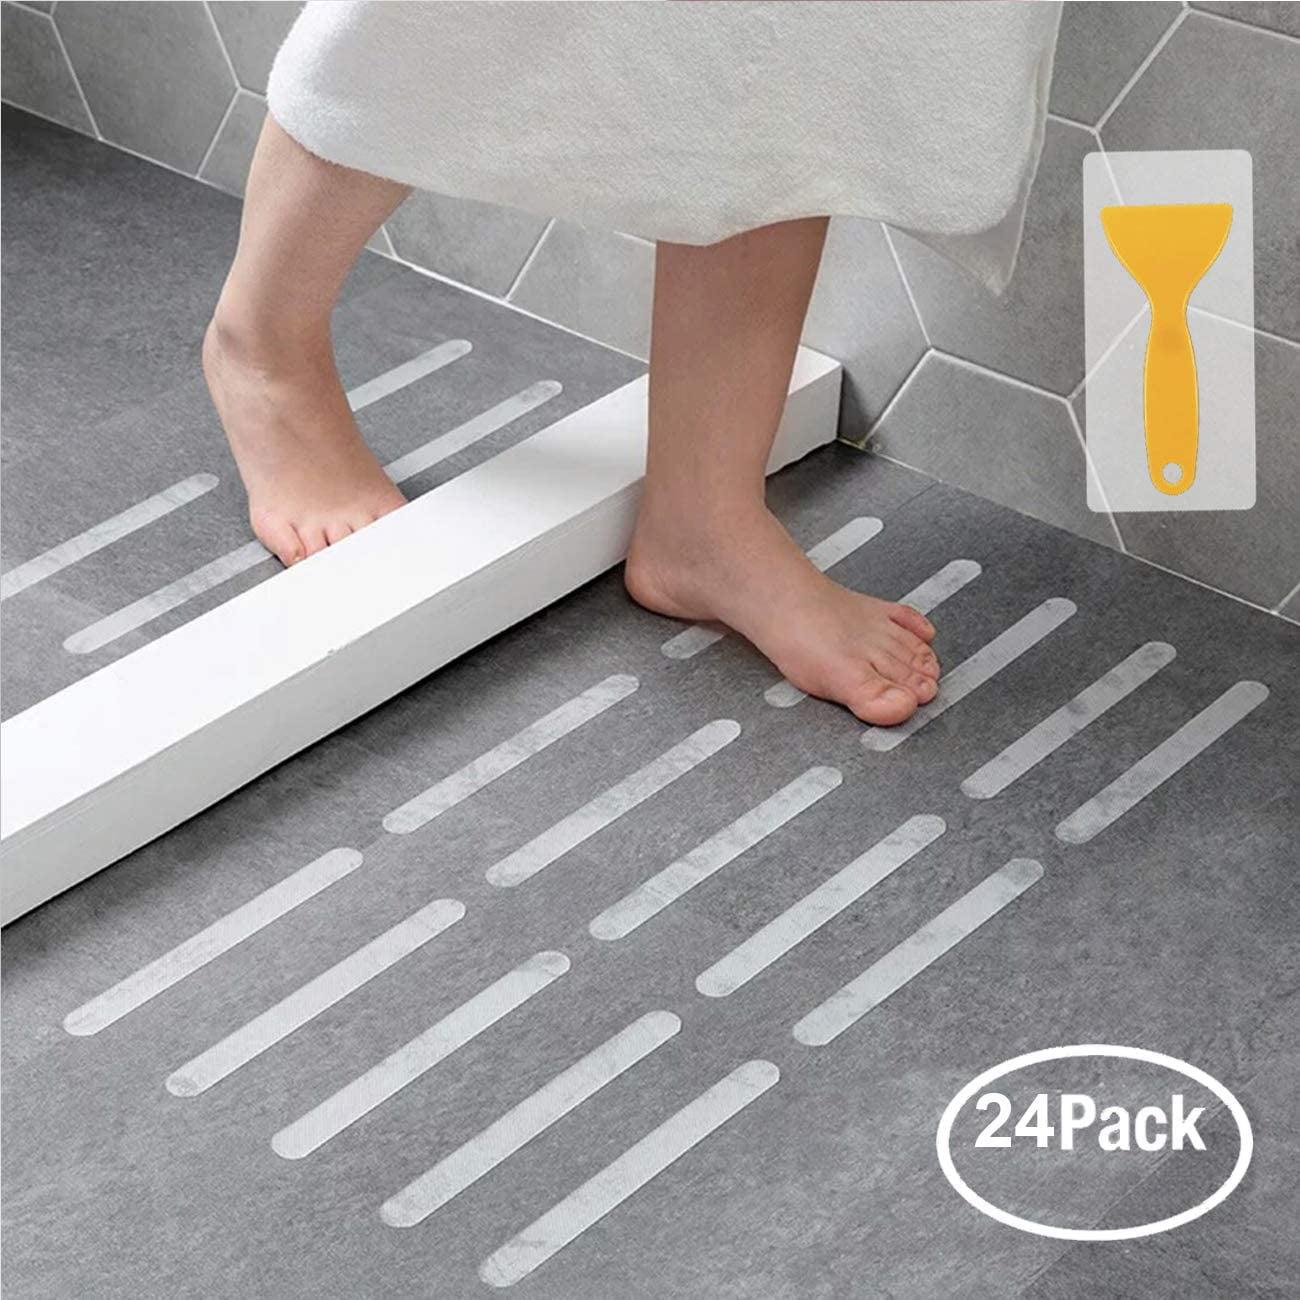 Non Slip Bathtub Stickers 28 PCS Adhesive Anti Slip Shower Stickers for Bath Tub,Bathroom,Stairs with Premium Scraper